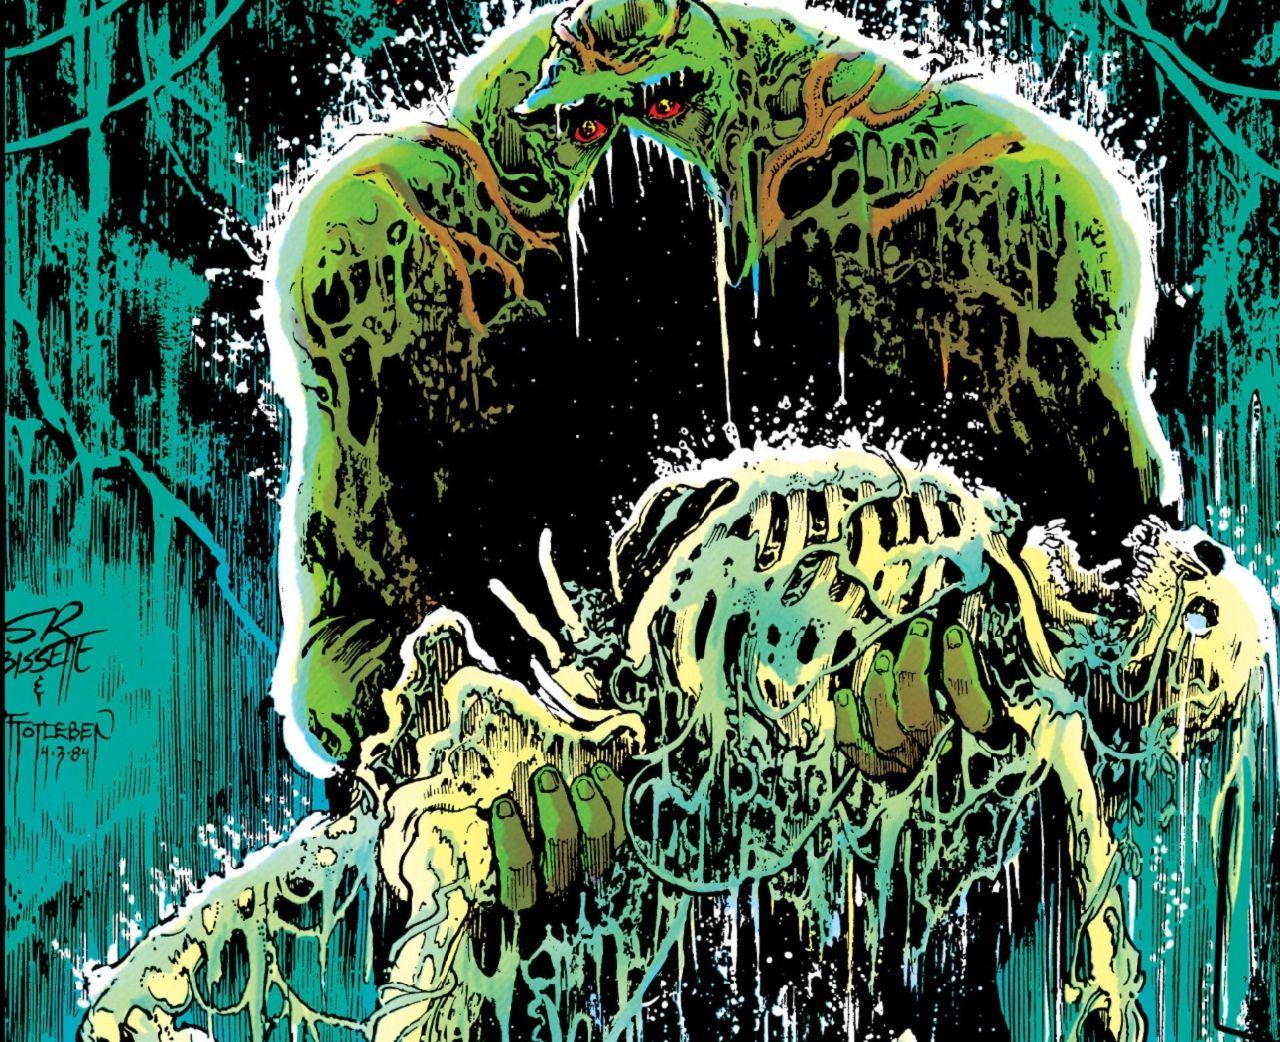 personajes de dc comics swamp thing